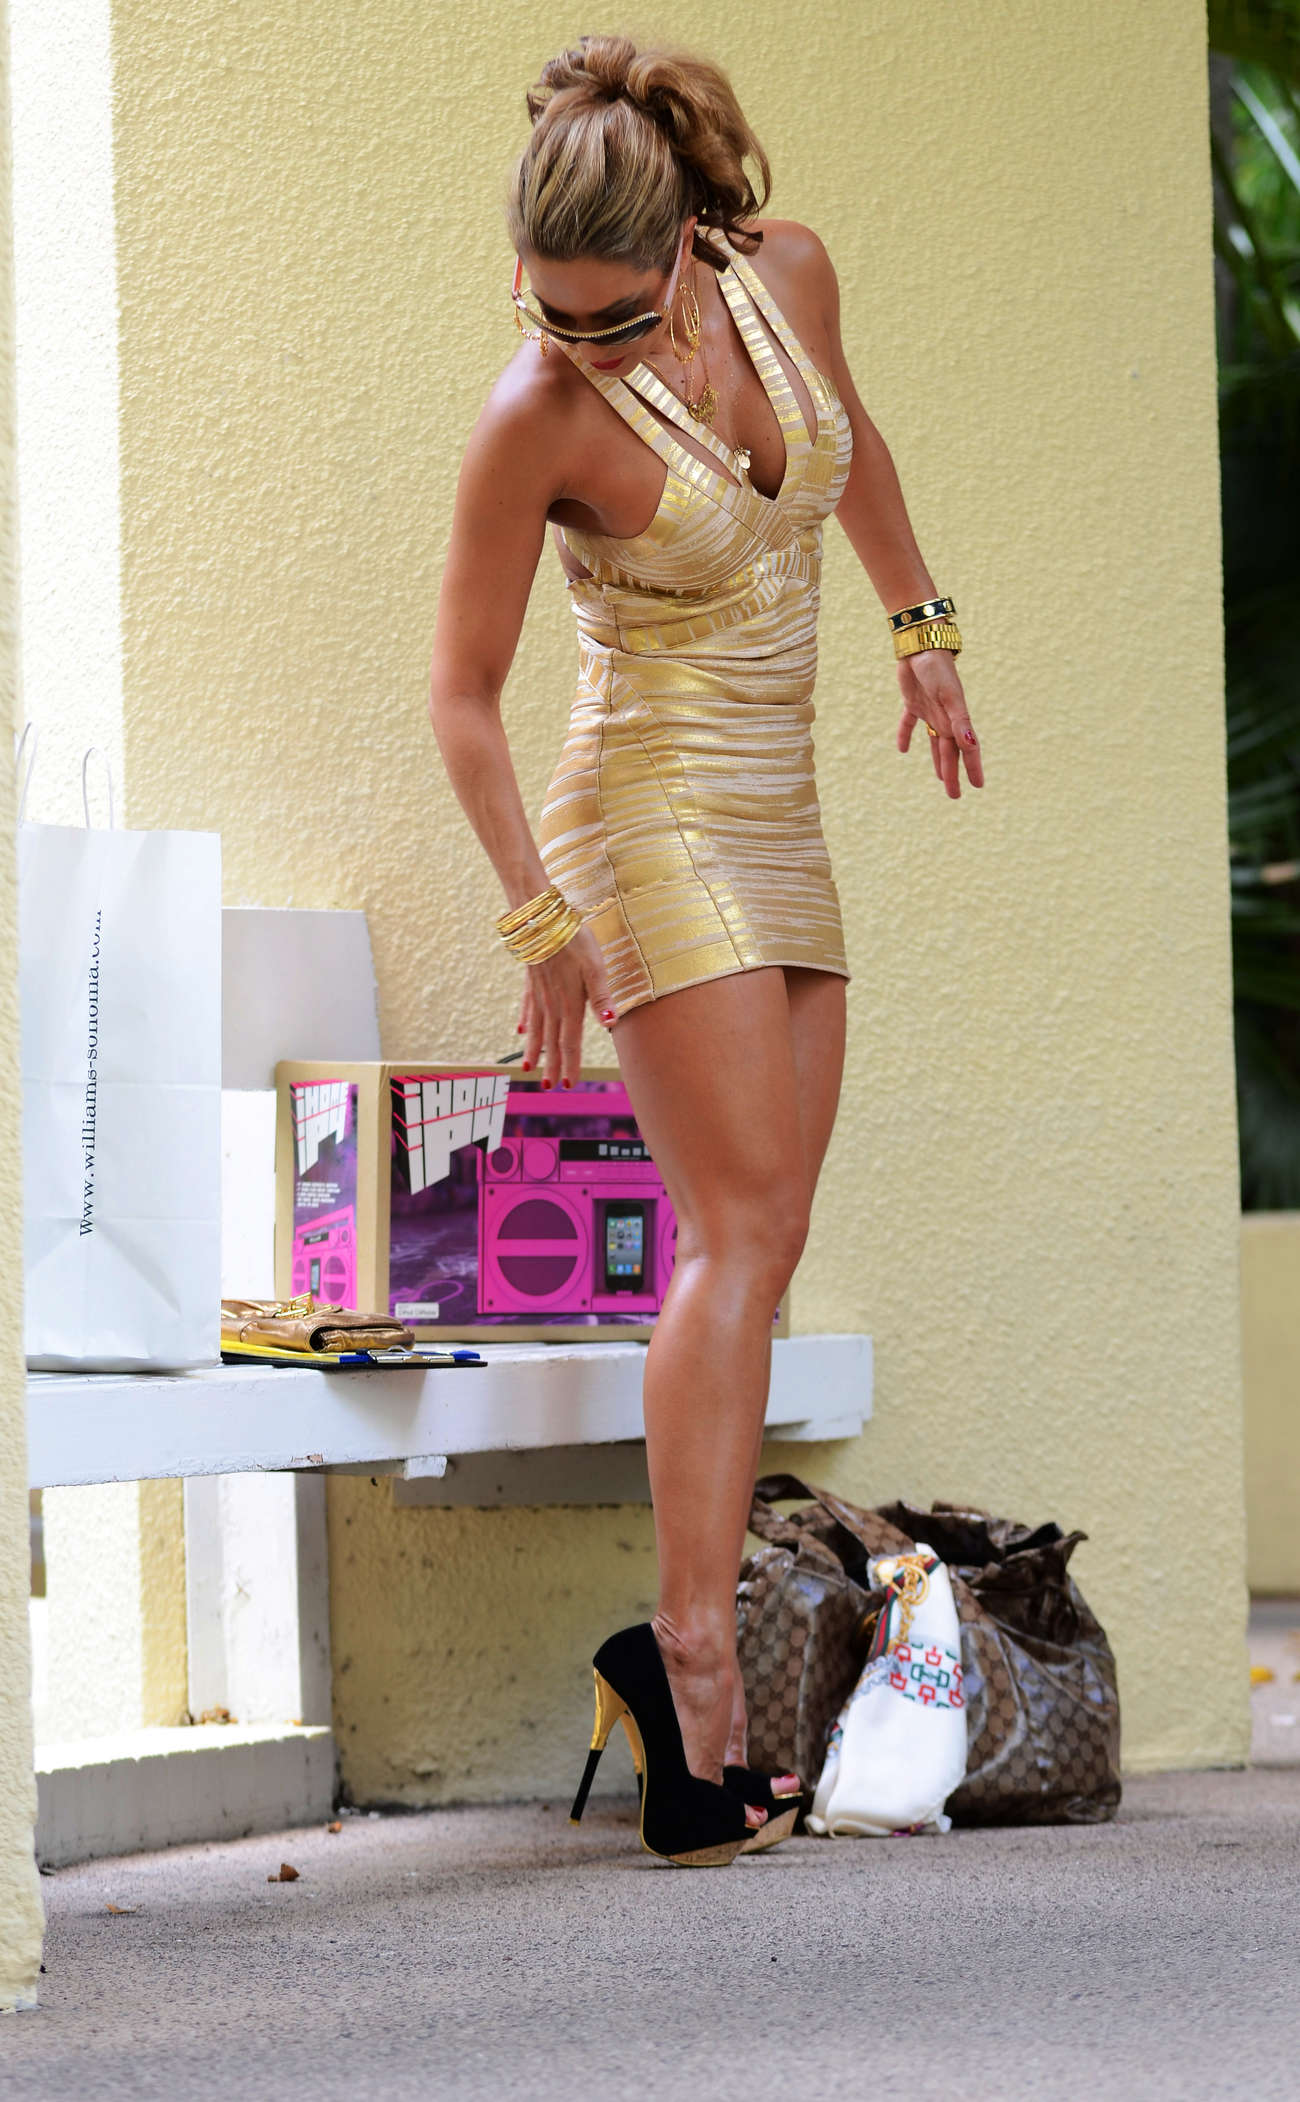 http://www.gotceleb.com/wp-content/uploads/celebrities/jennifer-nicole/lee-gold-dress-candids-miami-beach/Jennifer%20Nicole%20Lee%20-%20Gold%20Dress%20candids-11.jpg